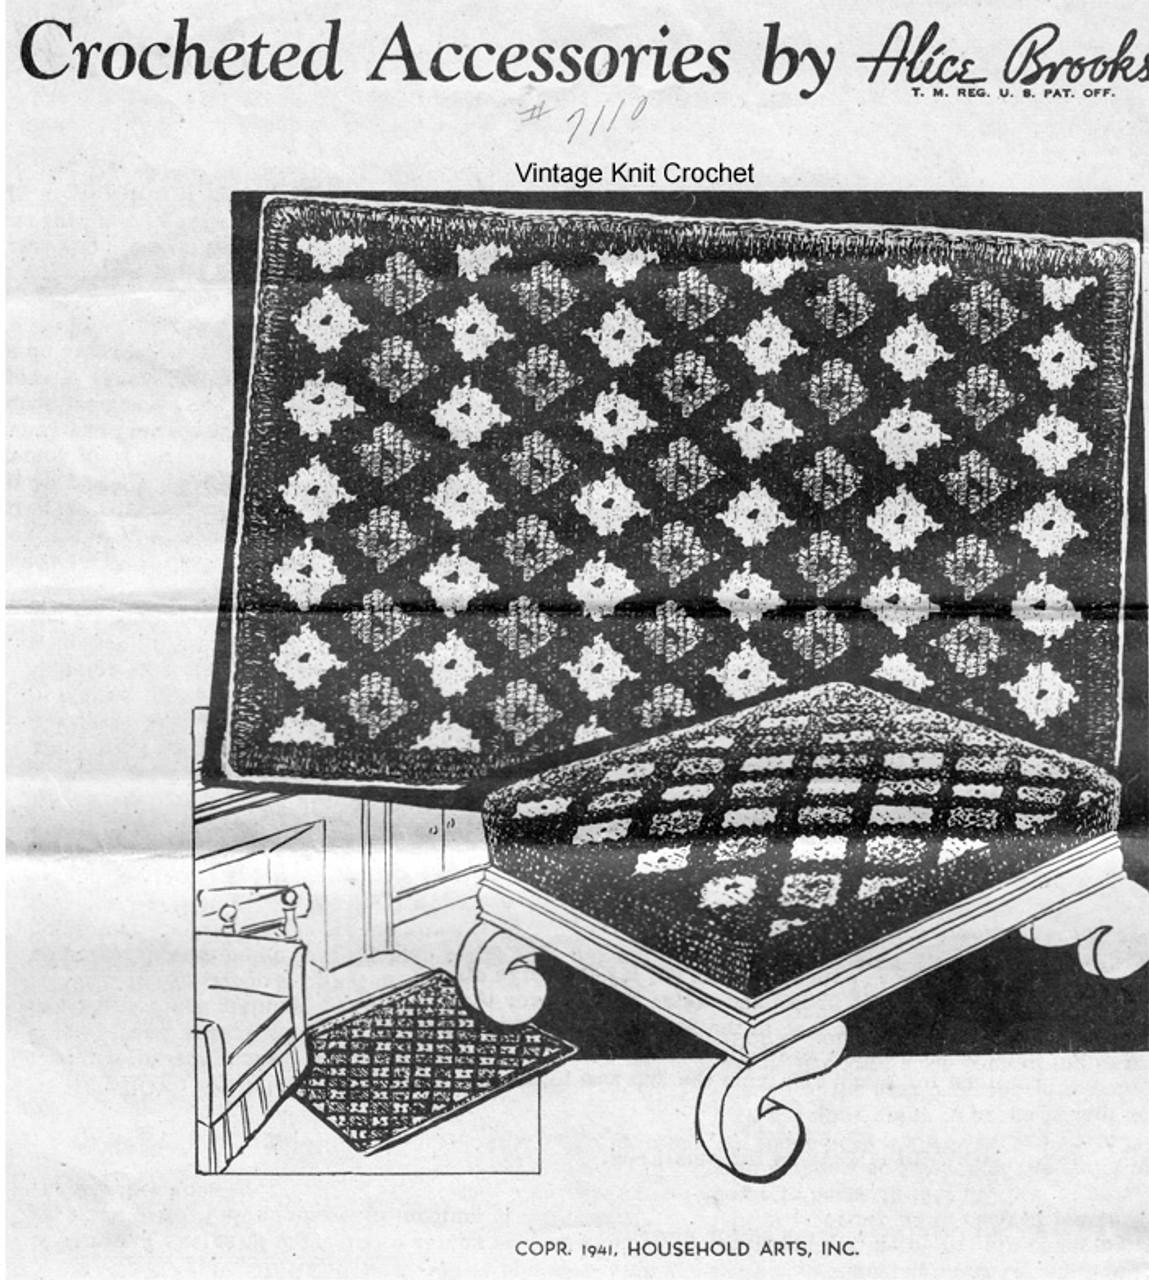 Large Rug Crochet Pattern, Mail Order 7110